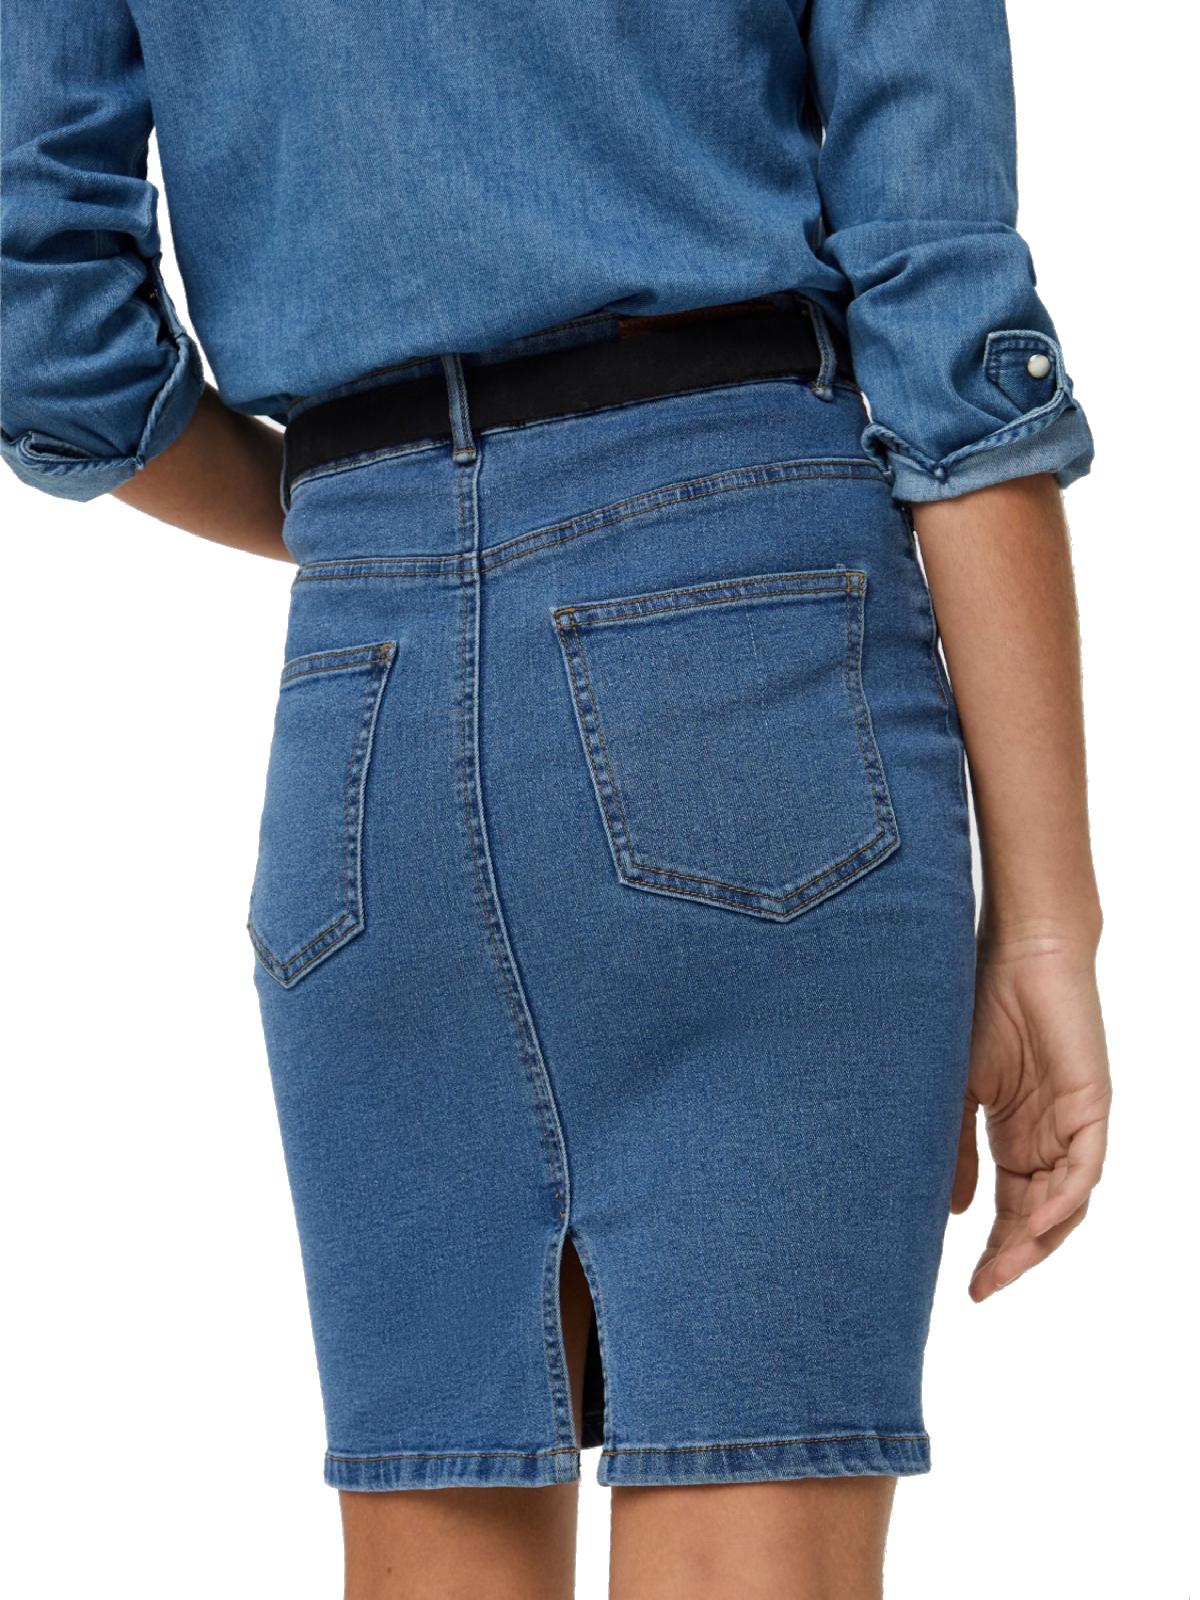 6fcc3a1f40 Vero Moda Damen Jeans-Rock Vmhot Nine Hw Pencil Skirt Damen Röcke